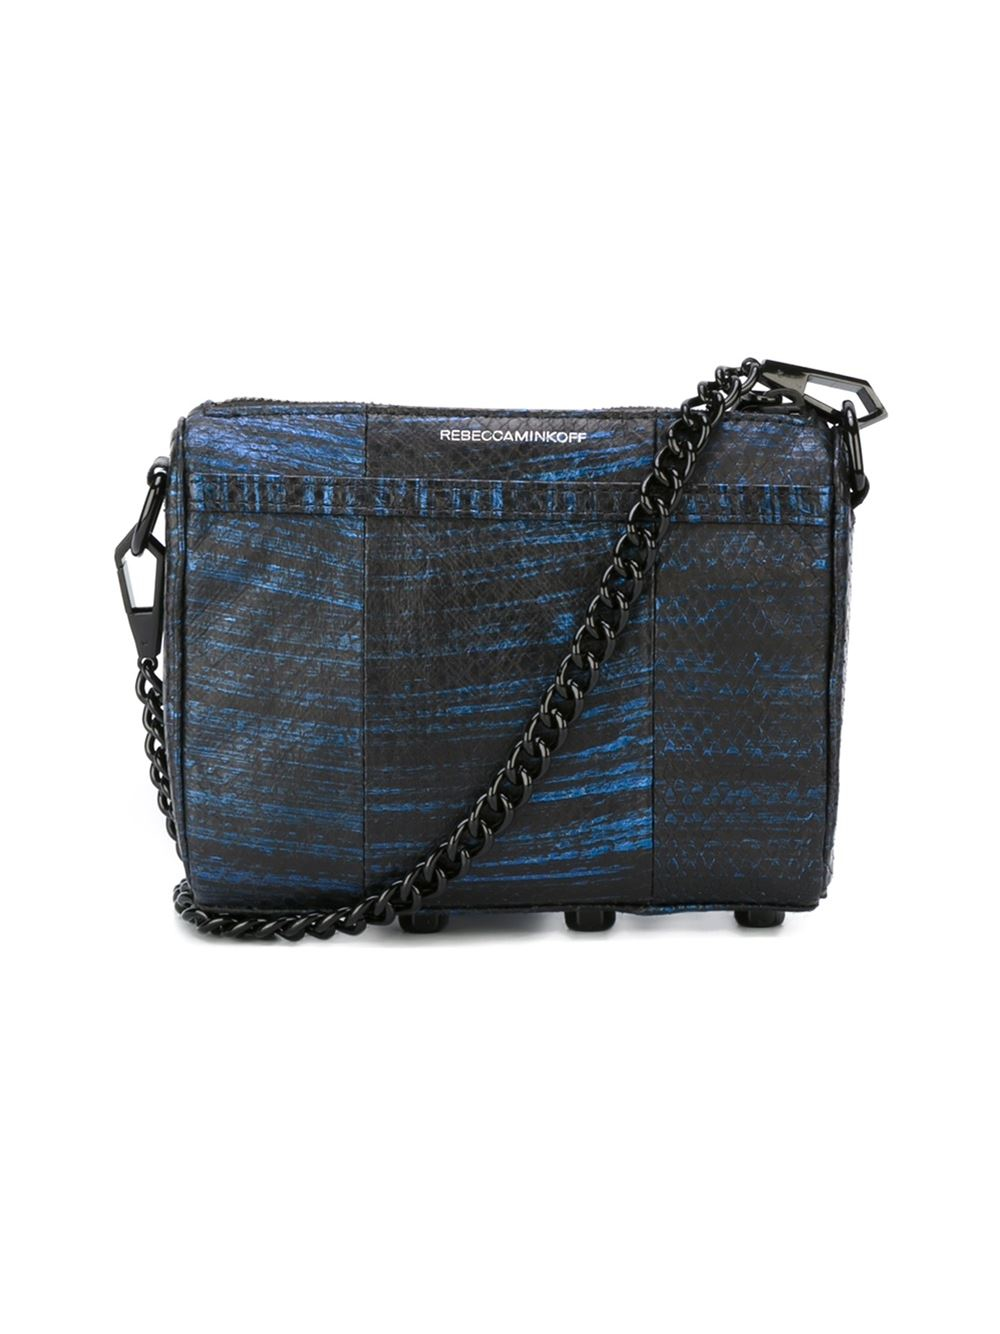 Rebecca Minkoff Leather Snakeskin Effect Crossbody Bag in Blue